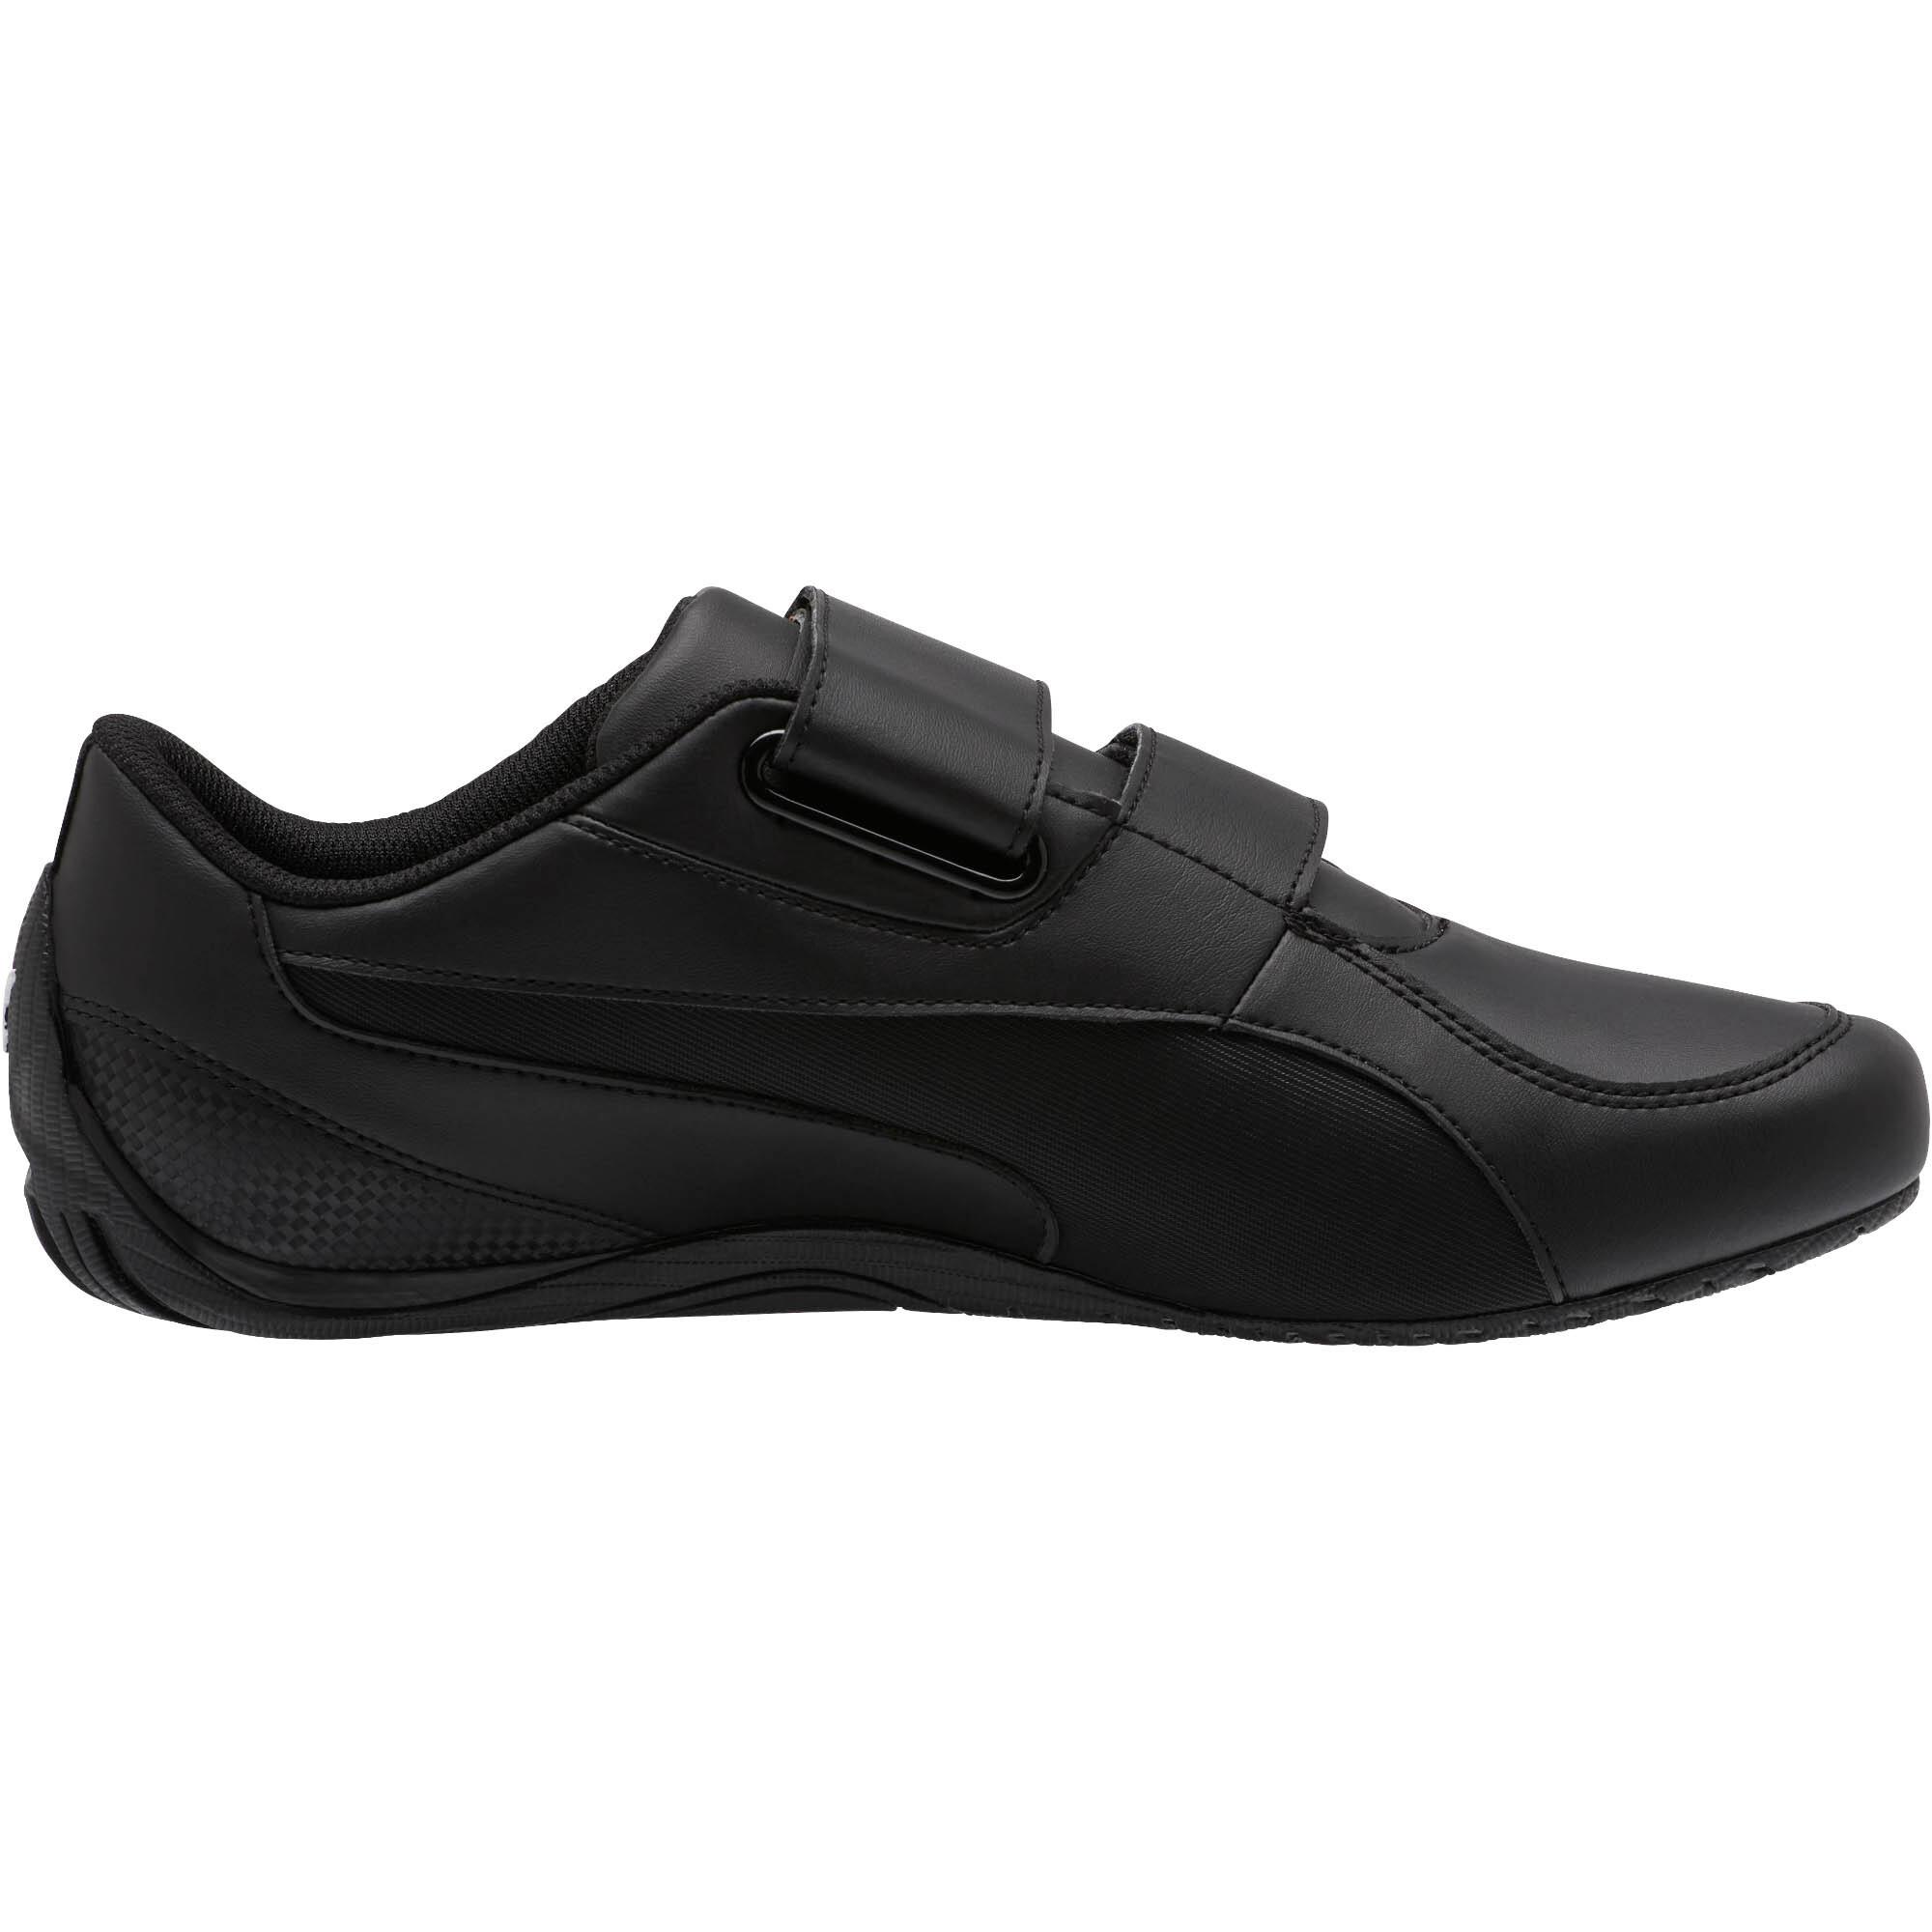 PUMA-Drift-Cat-5-AC-Men-039-s-Shoes-Unisex-Shoe-Basics miniatura 10